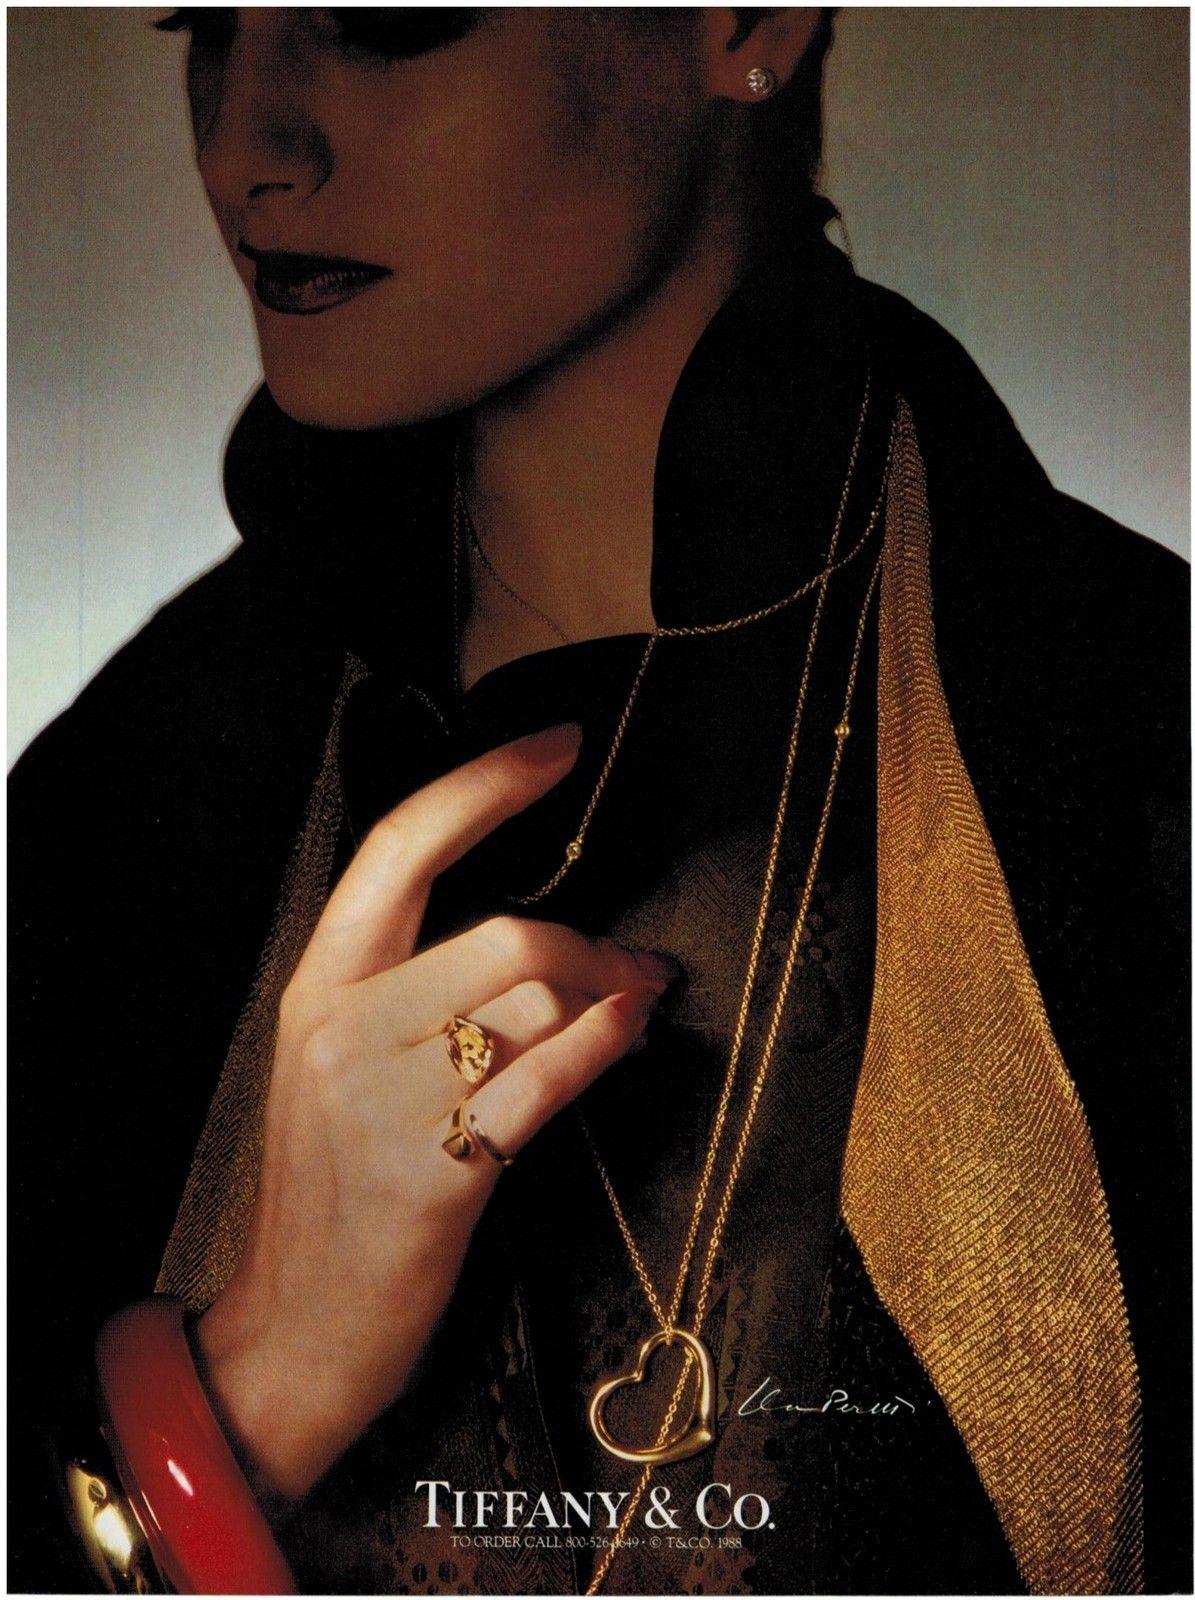 1988 TIFFANY & CO JEWELRY ELSA PERETTI Chain & pendant heart PRINT AD